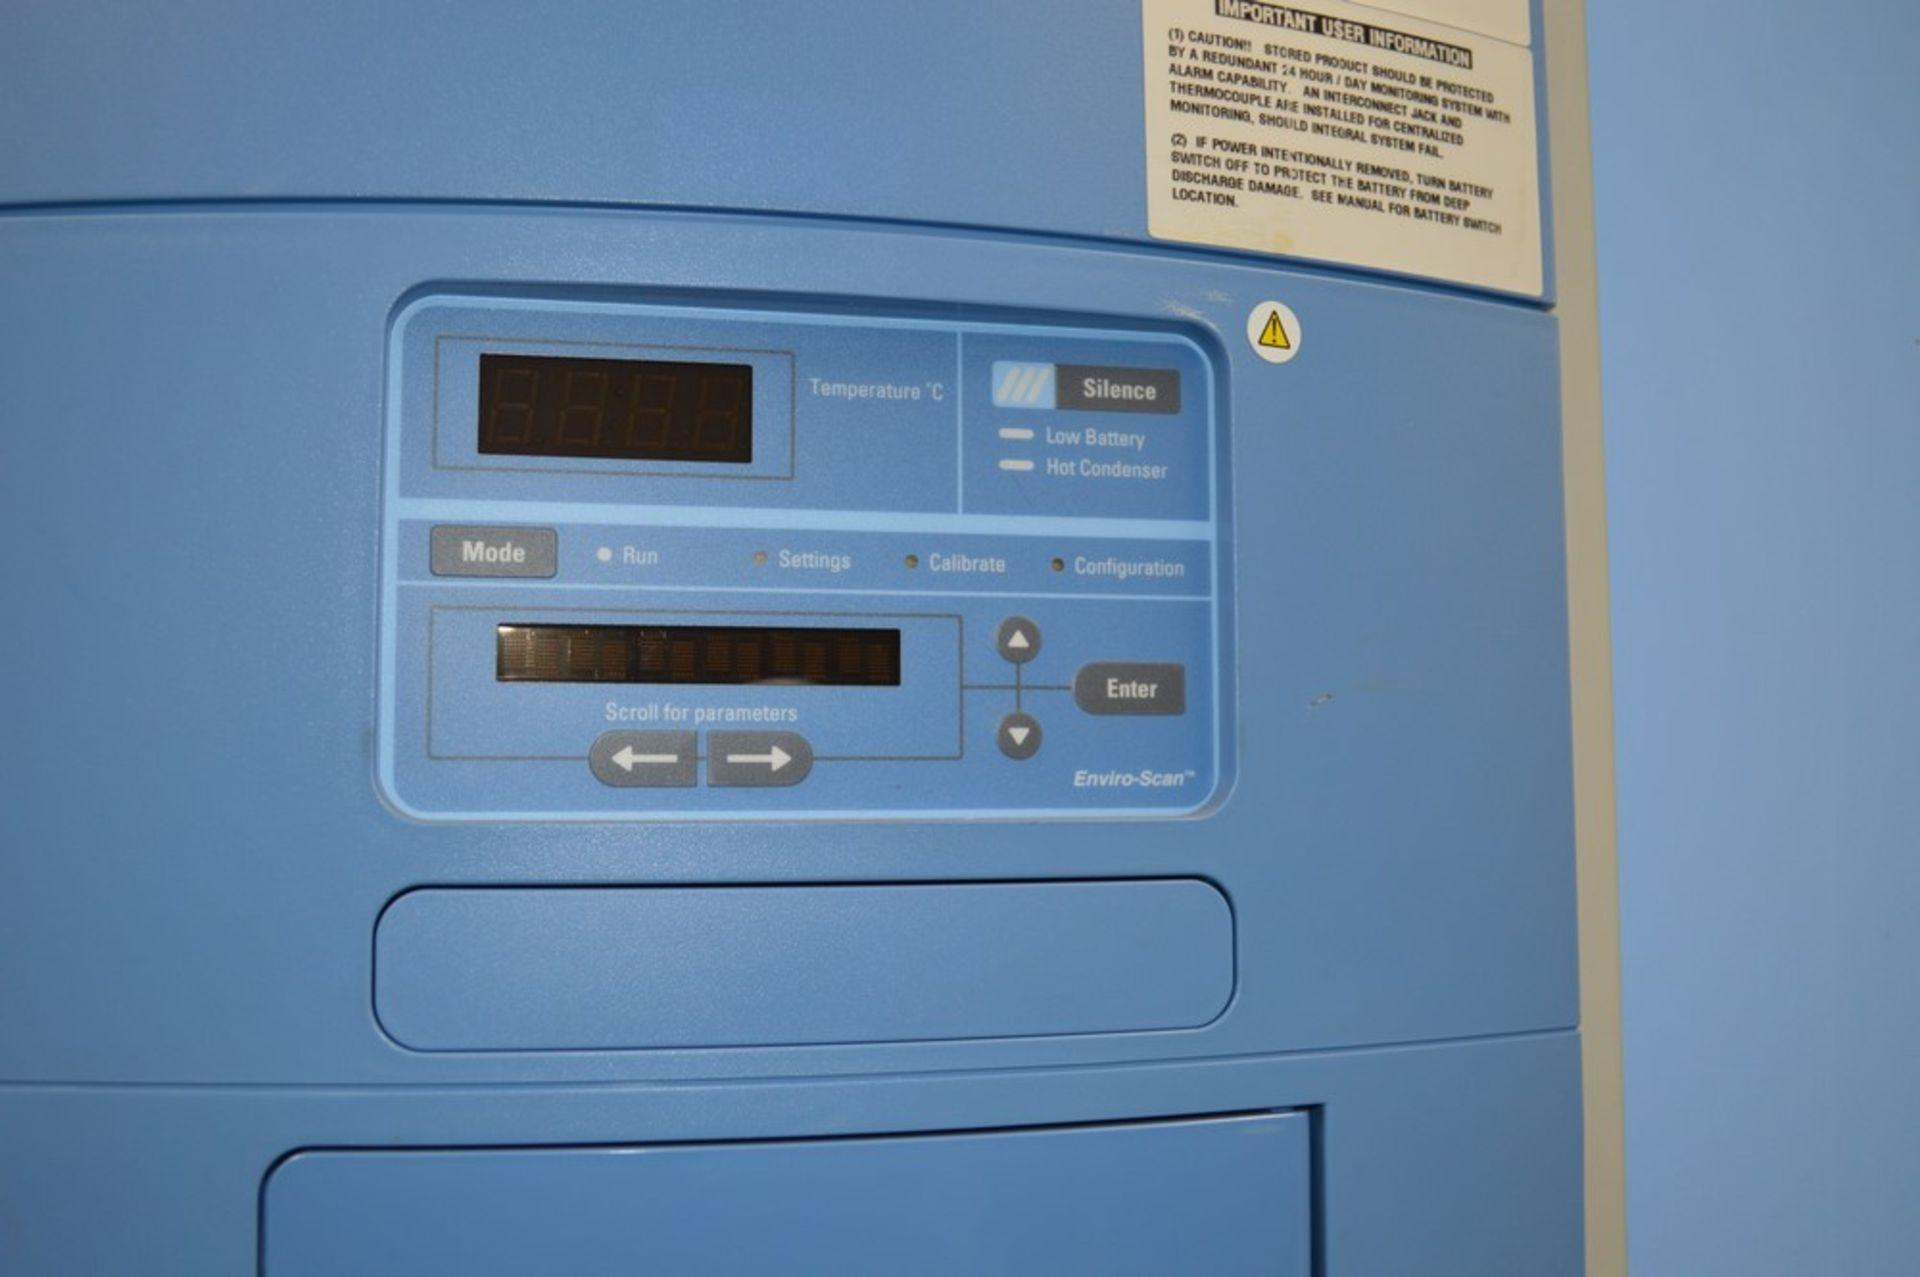 Therma Scientific Forma 8600 Series, Model 8656 Deep Freeze Refrigorator (-86 F) - Image 7 of 7